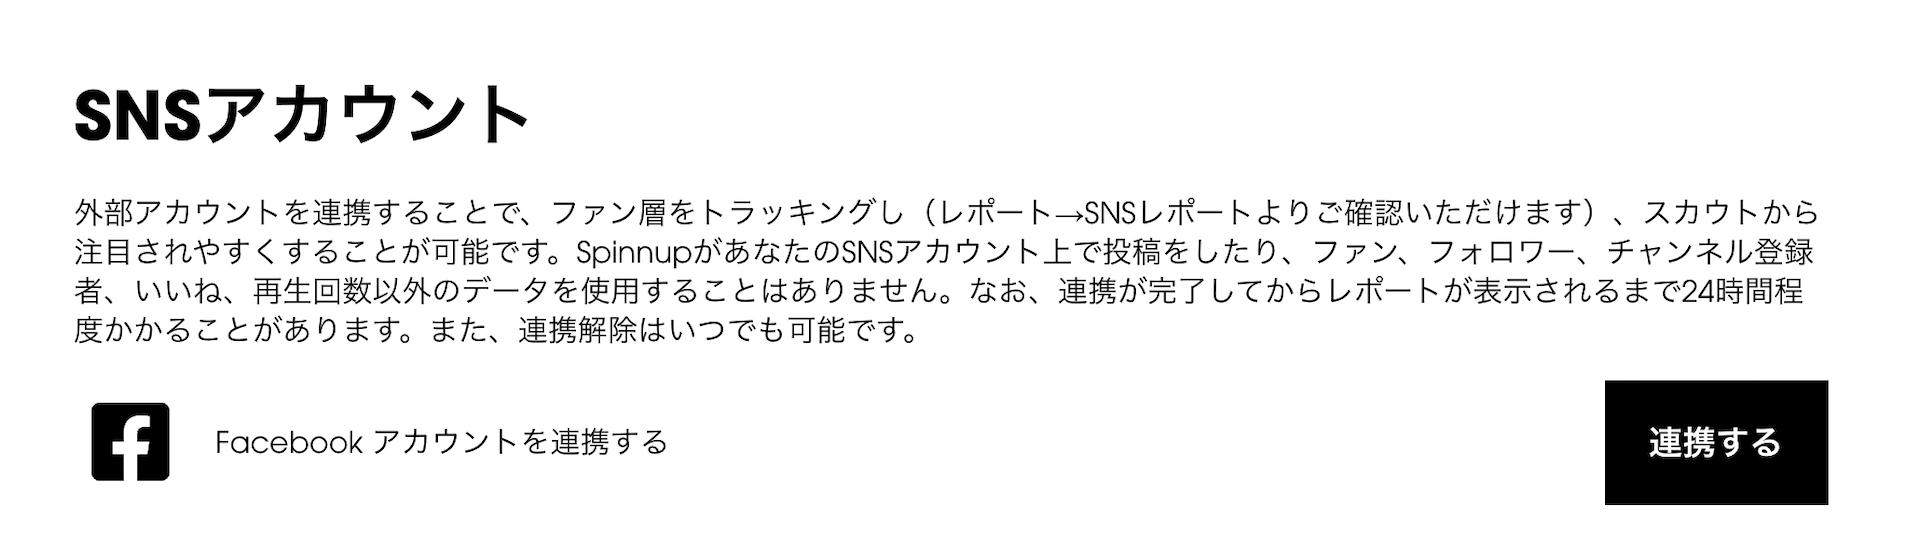 SNS連携-FacebookアカウントをSpinnupに連携する